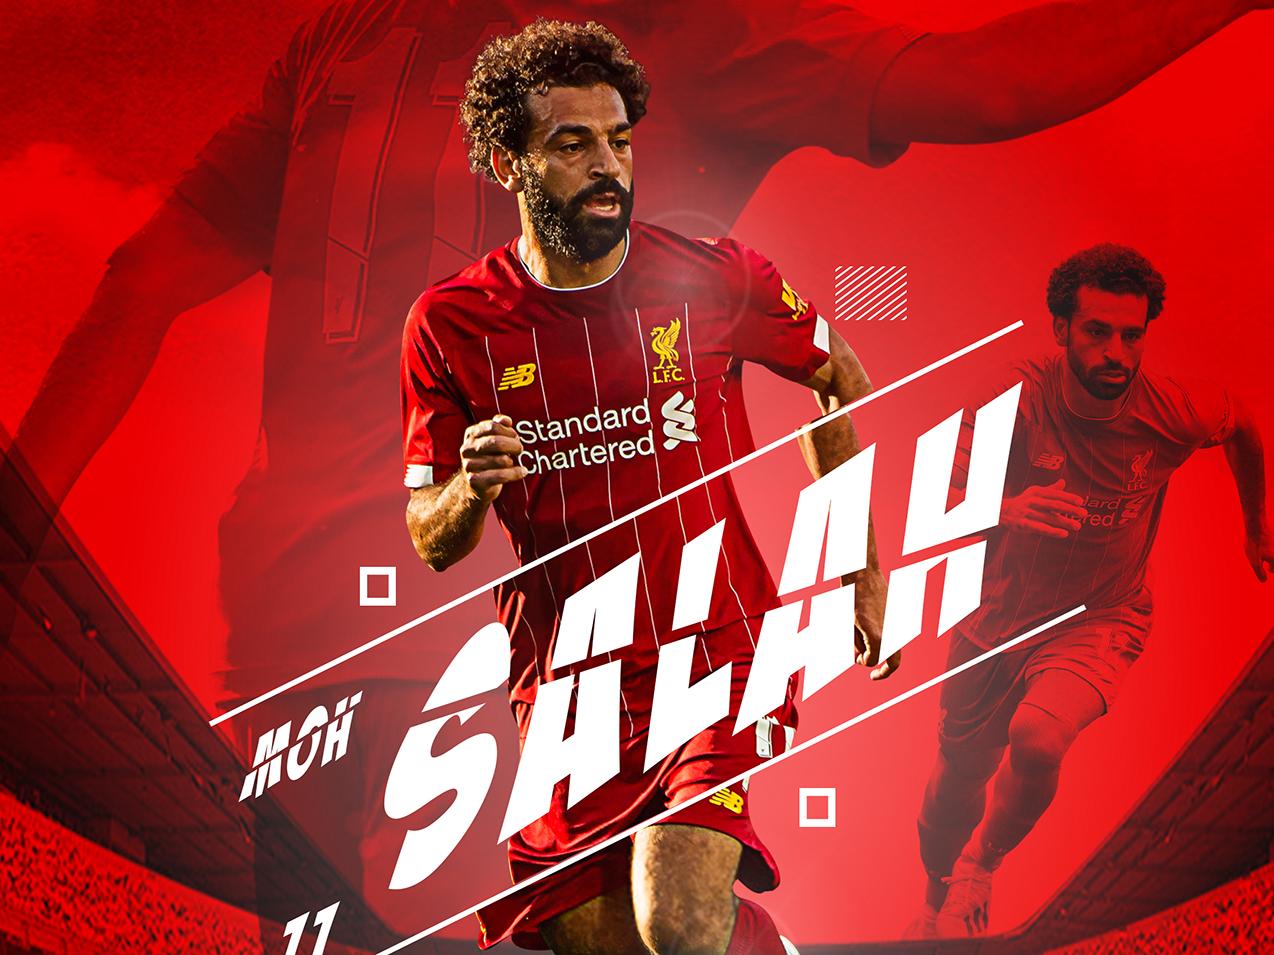 Salah photoshop sports poster sports design poster design salah liverpool fc premierleague